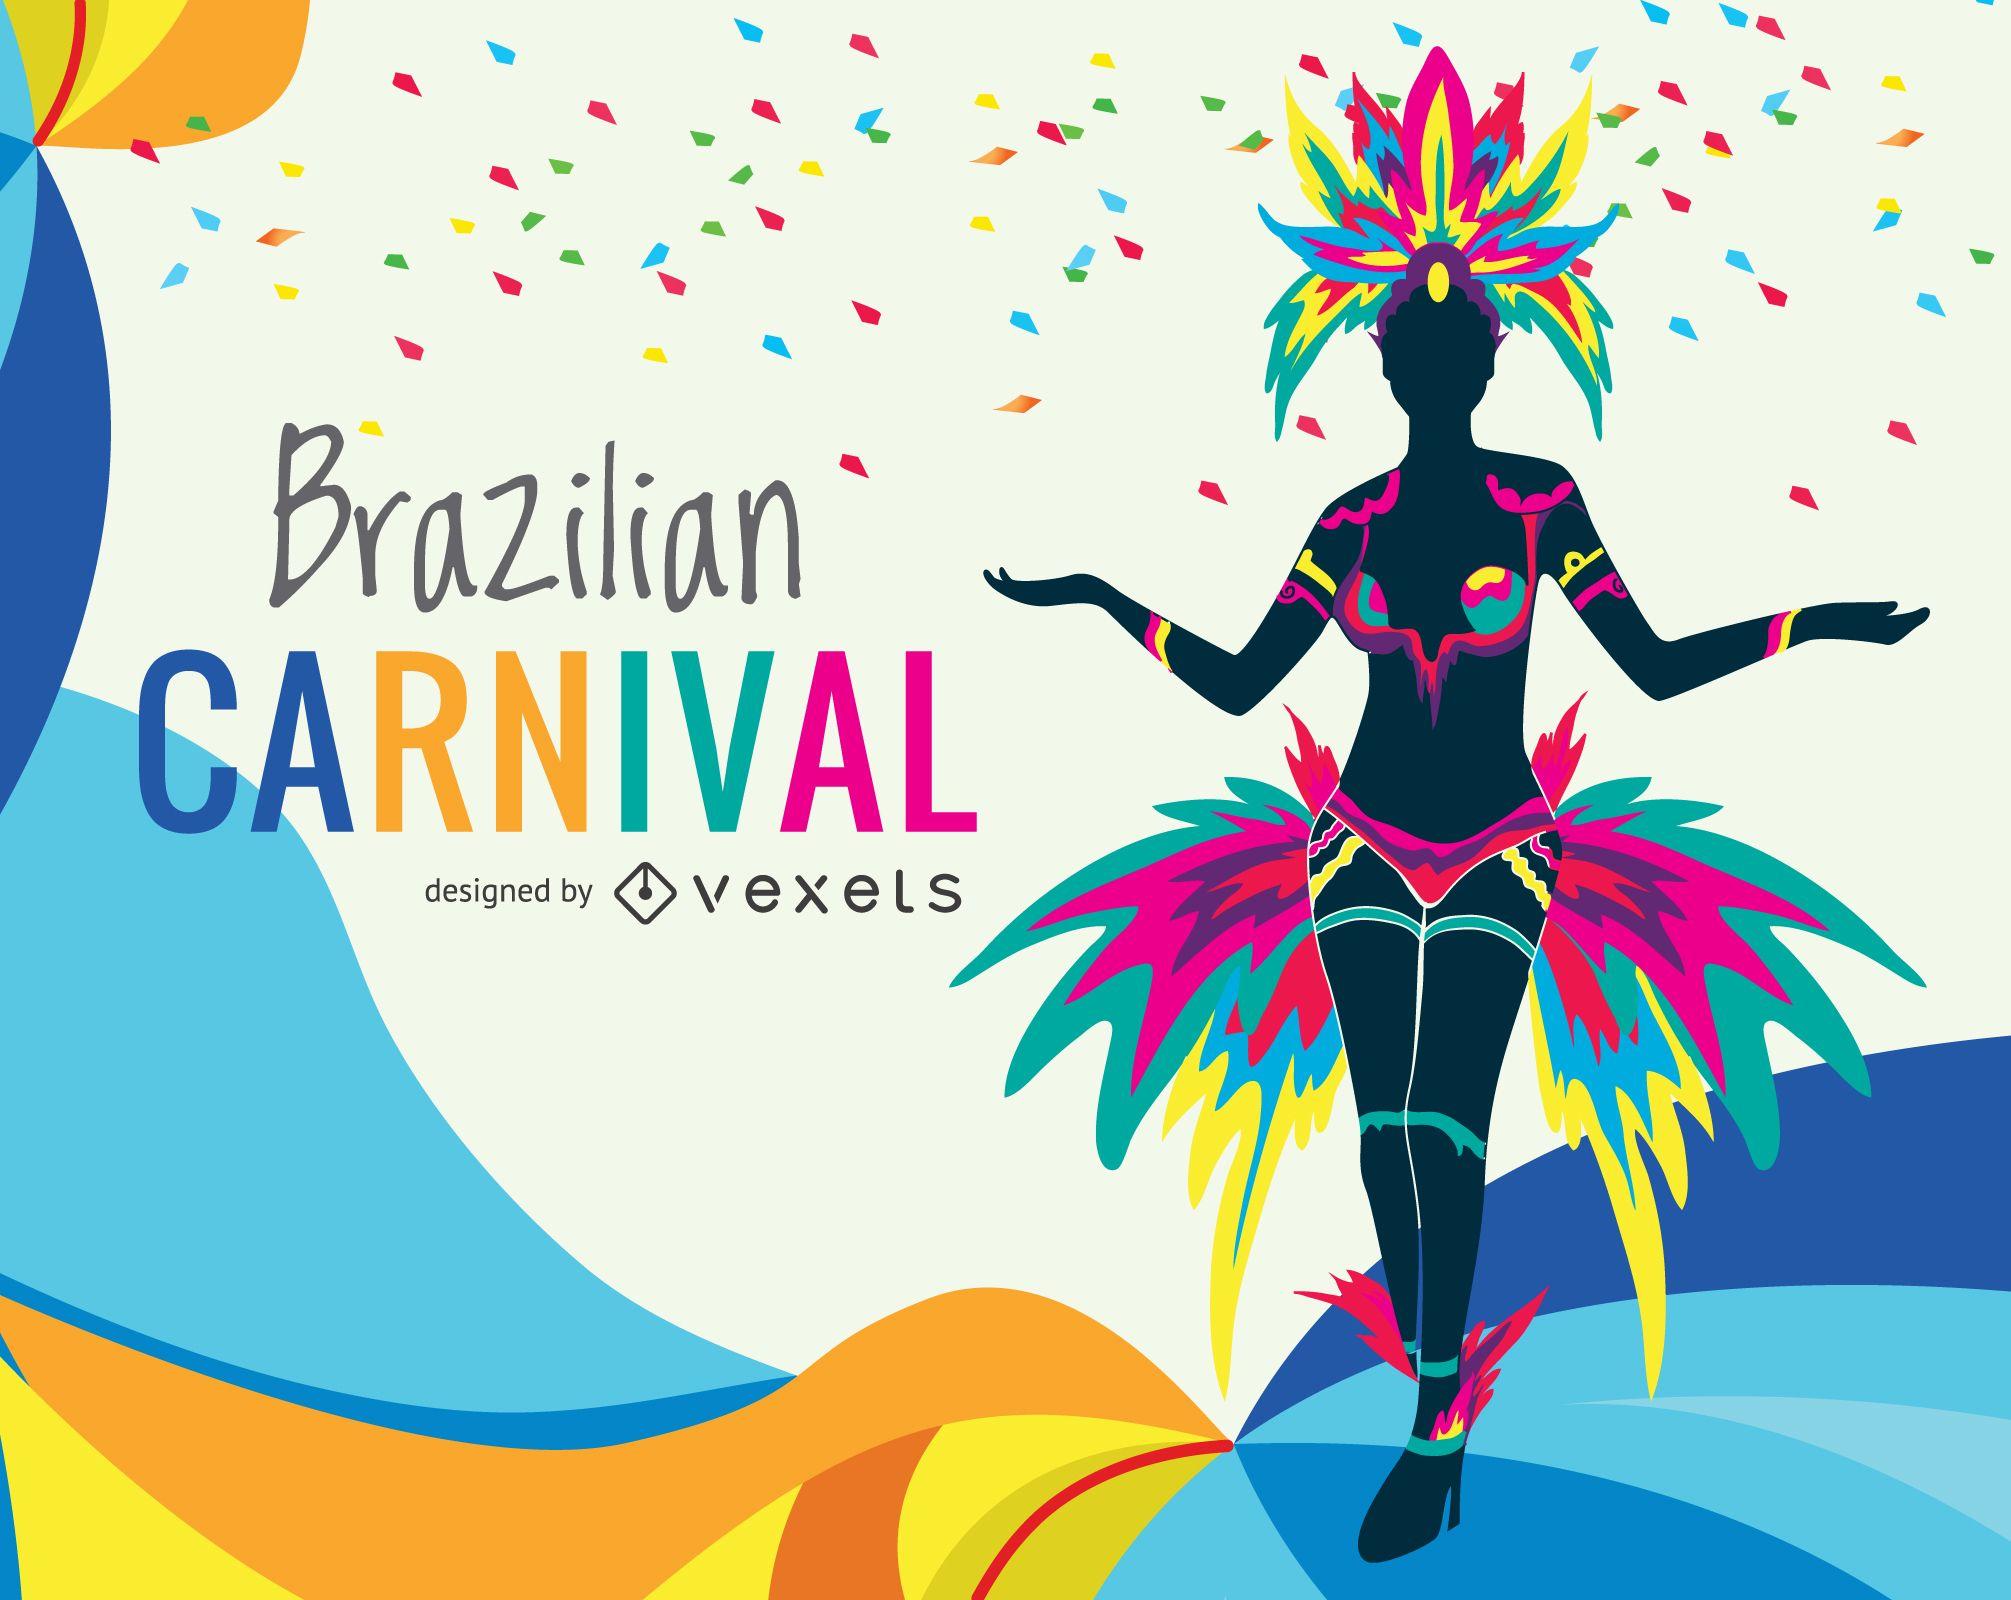 Colorful Carnival illustration